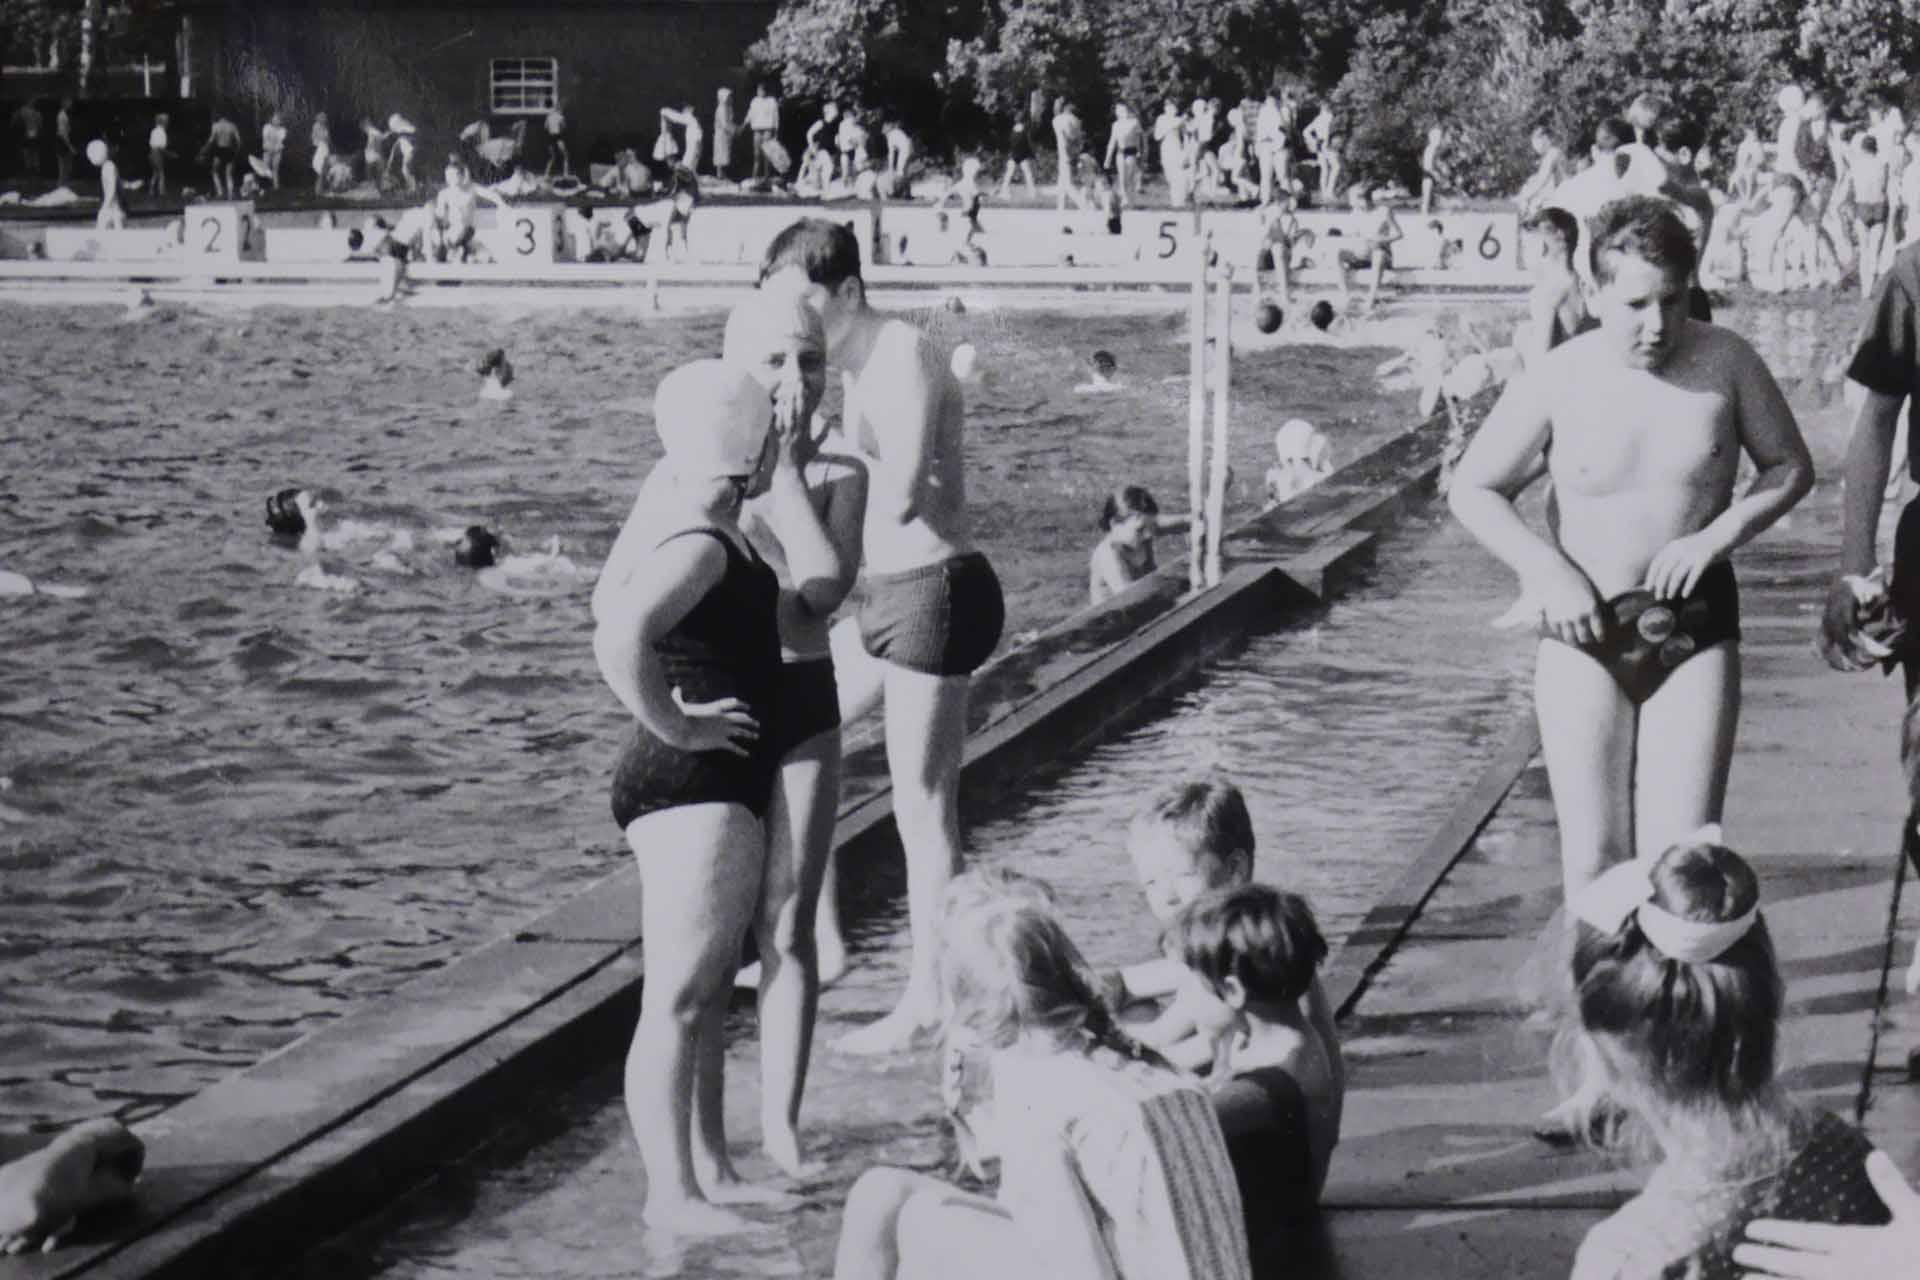 Viel los im Freibad Wunstorf in den 1970ern